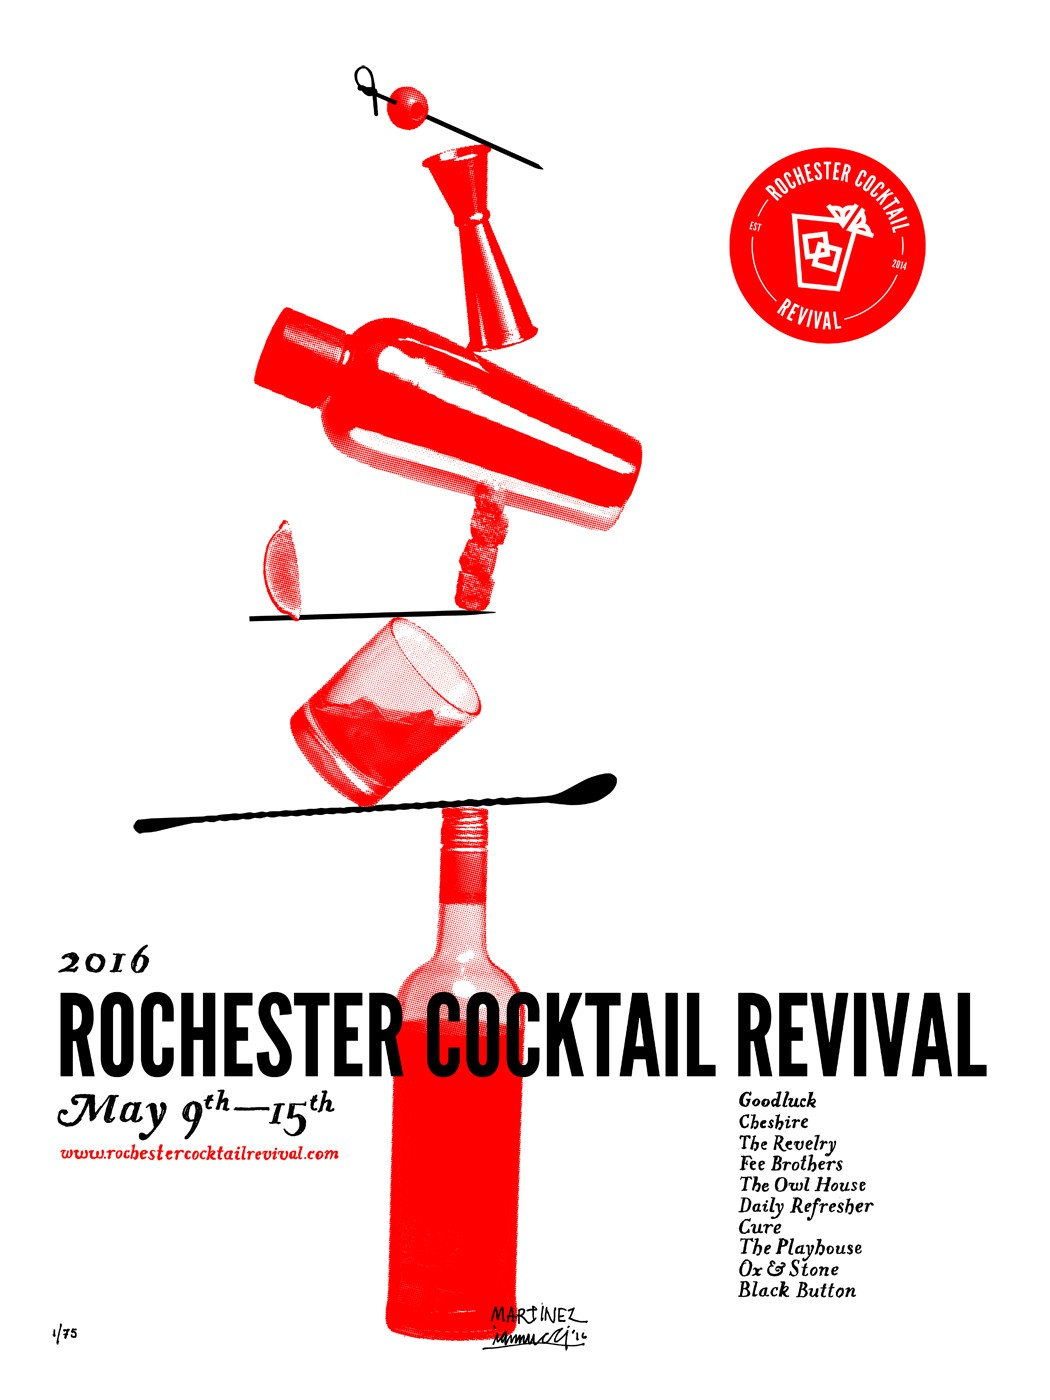 RochesterCocktailRevival